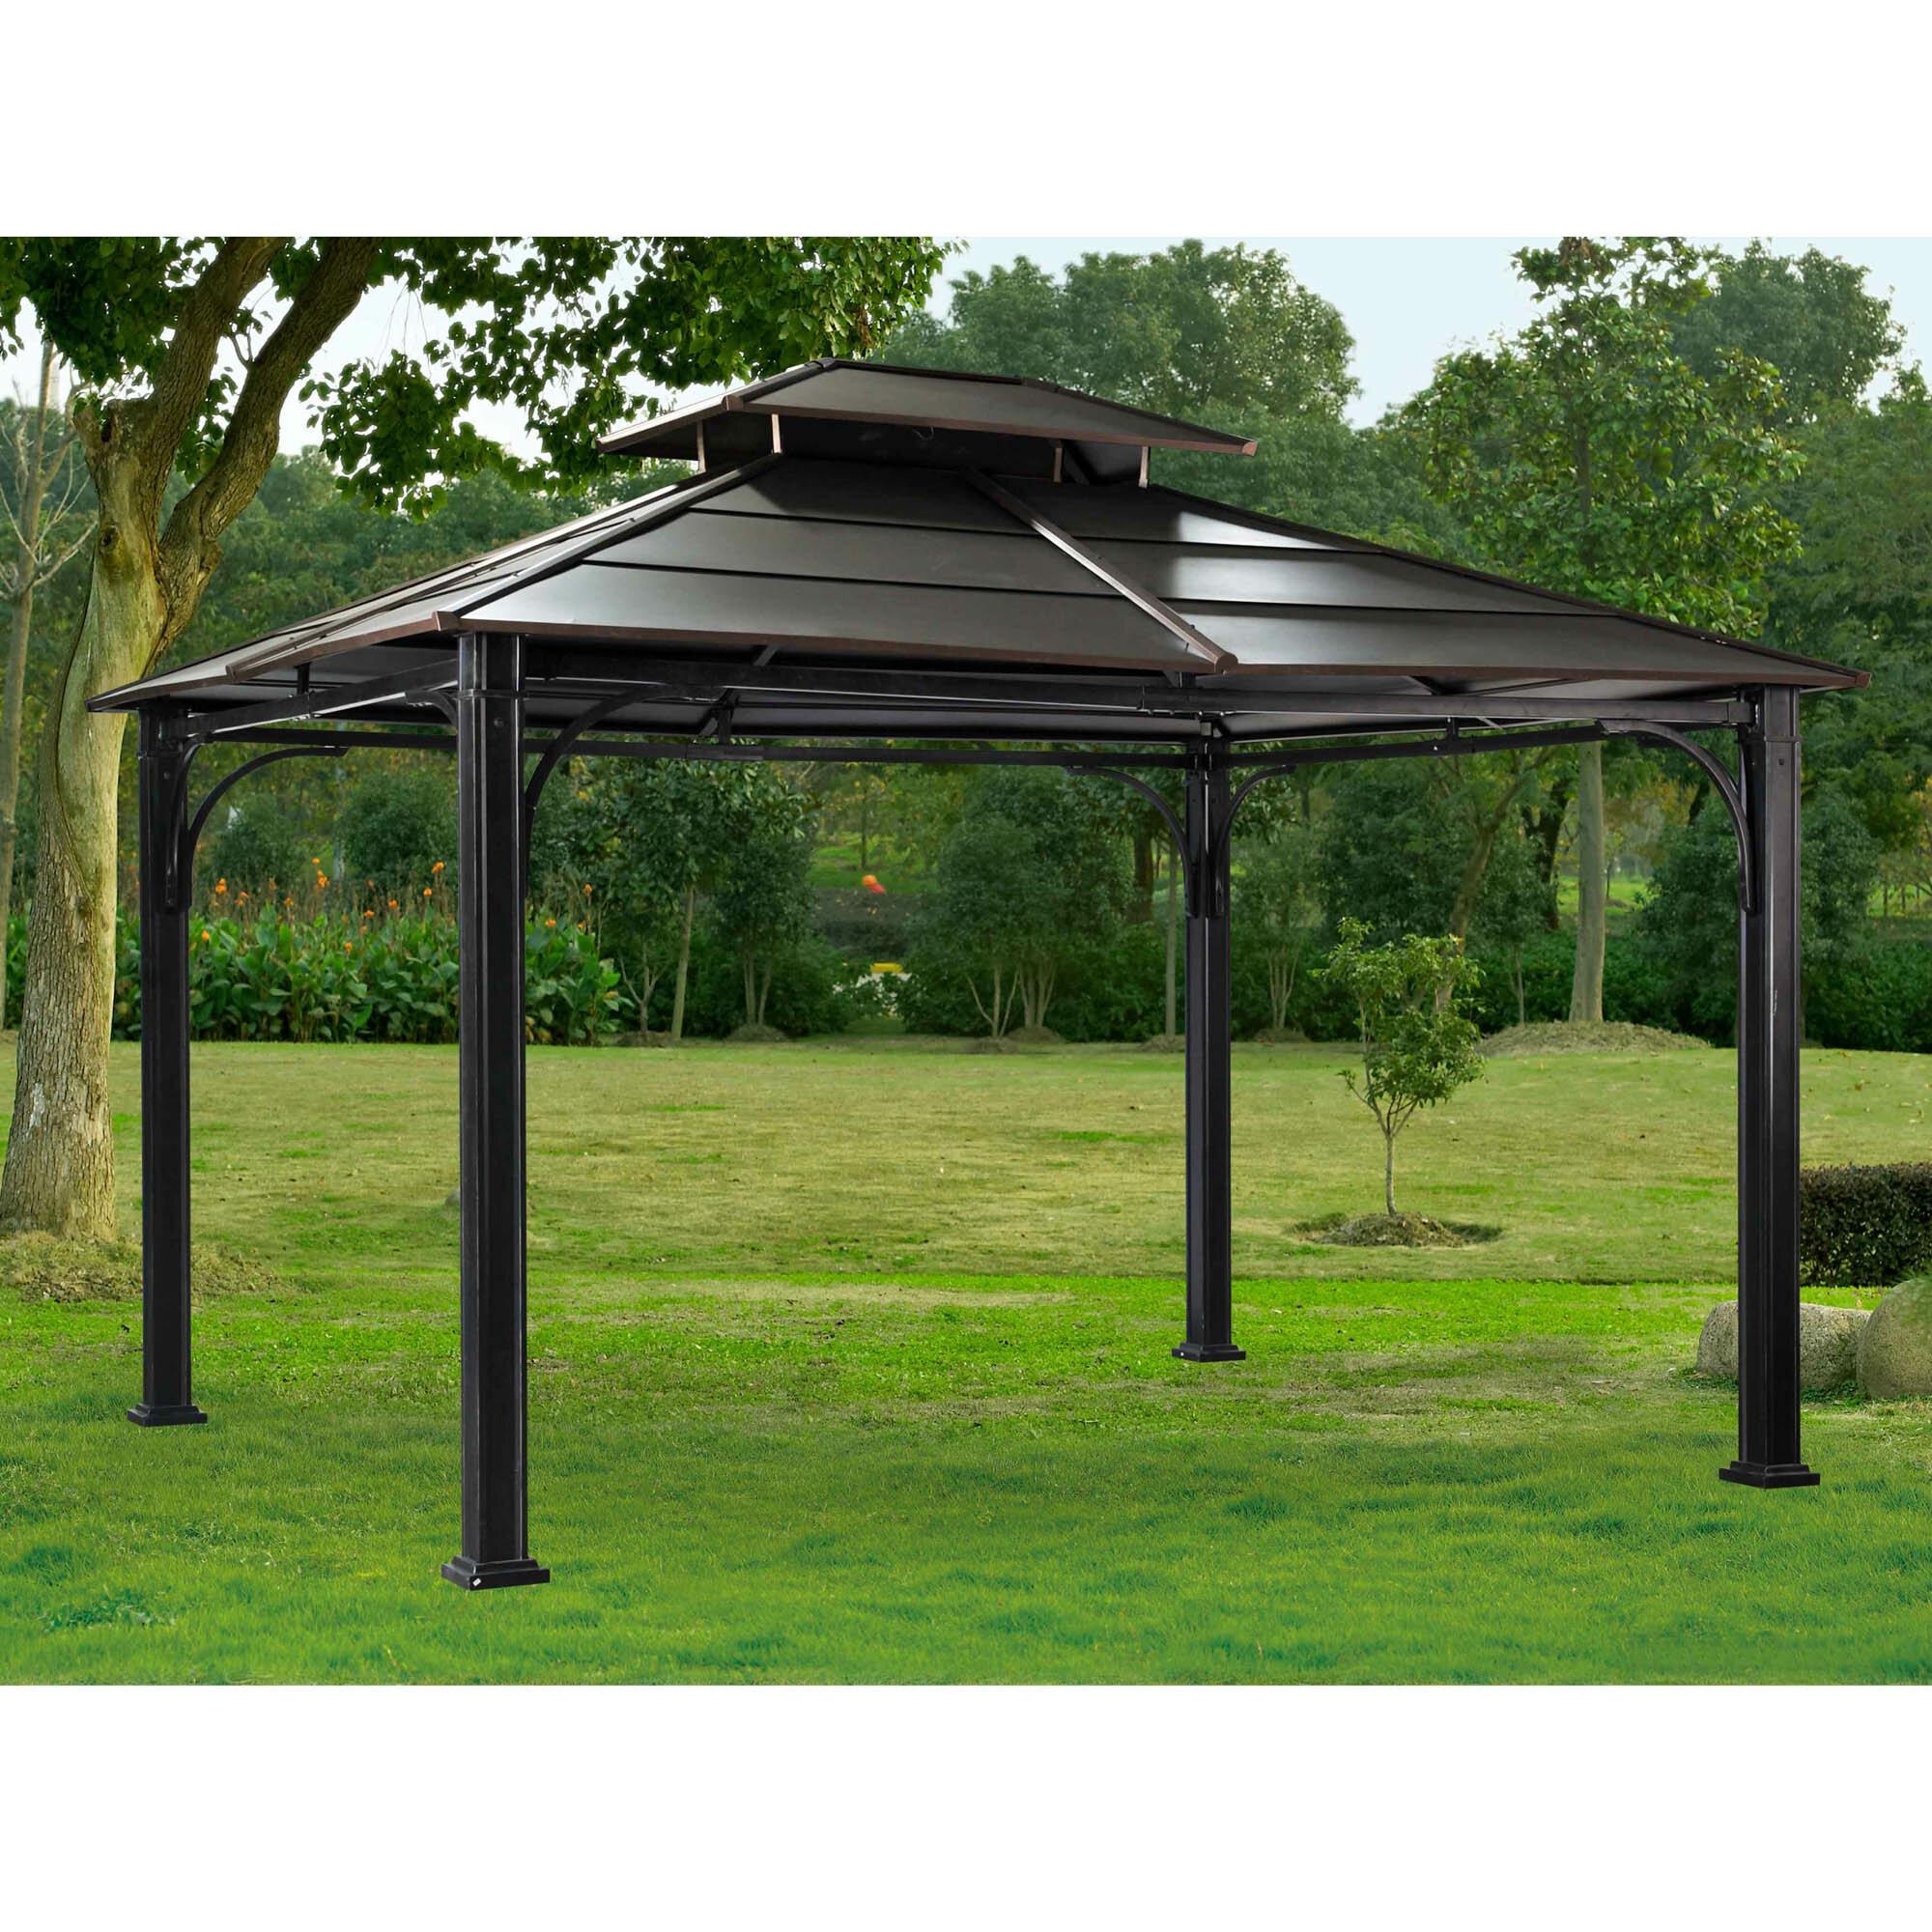 design plan outdoor wonderful gazebo ideas decorating lawn in amp garden patio